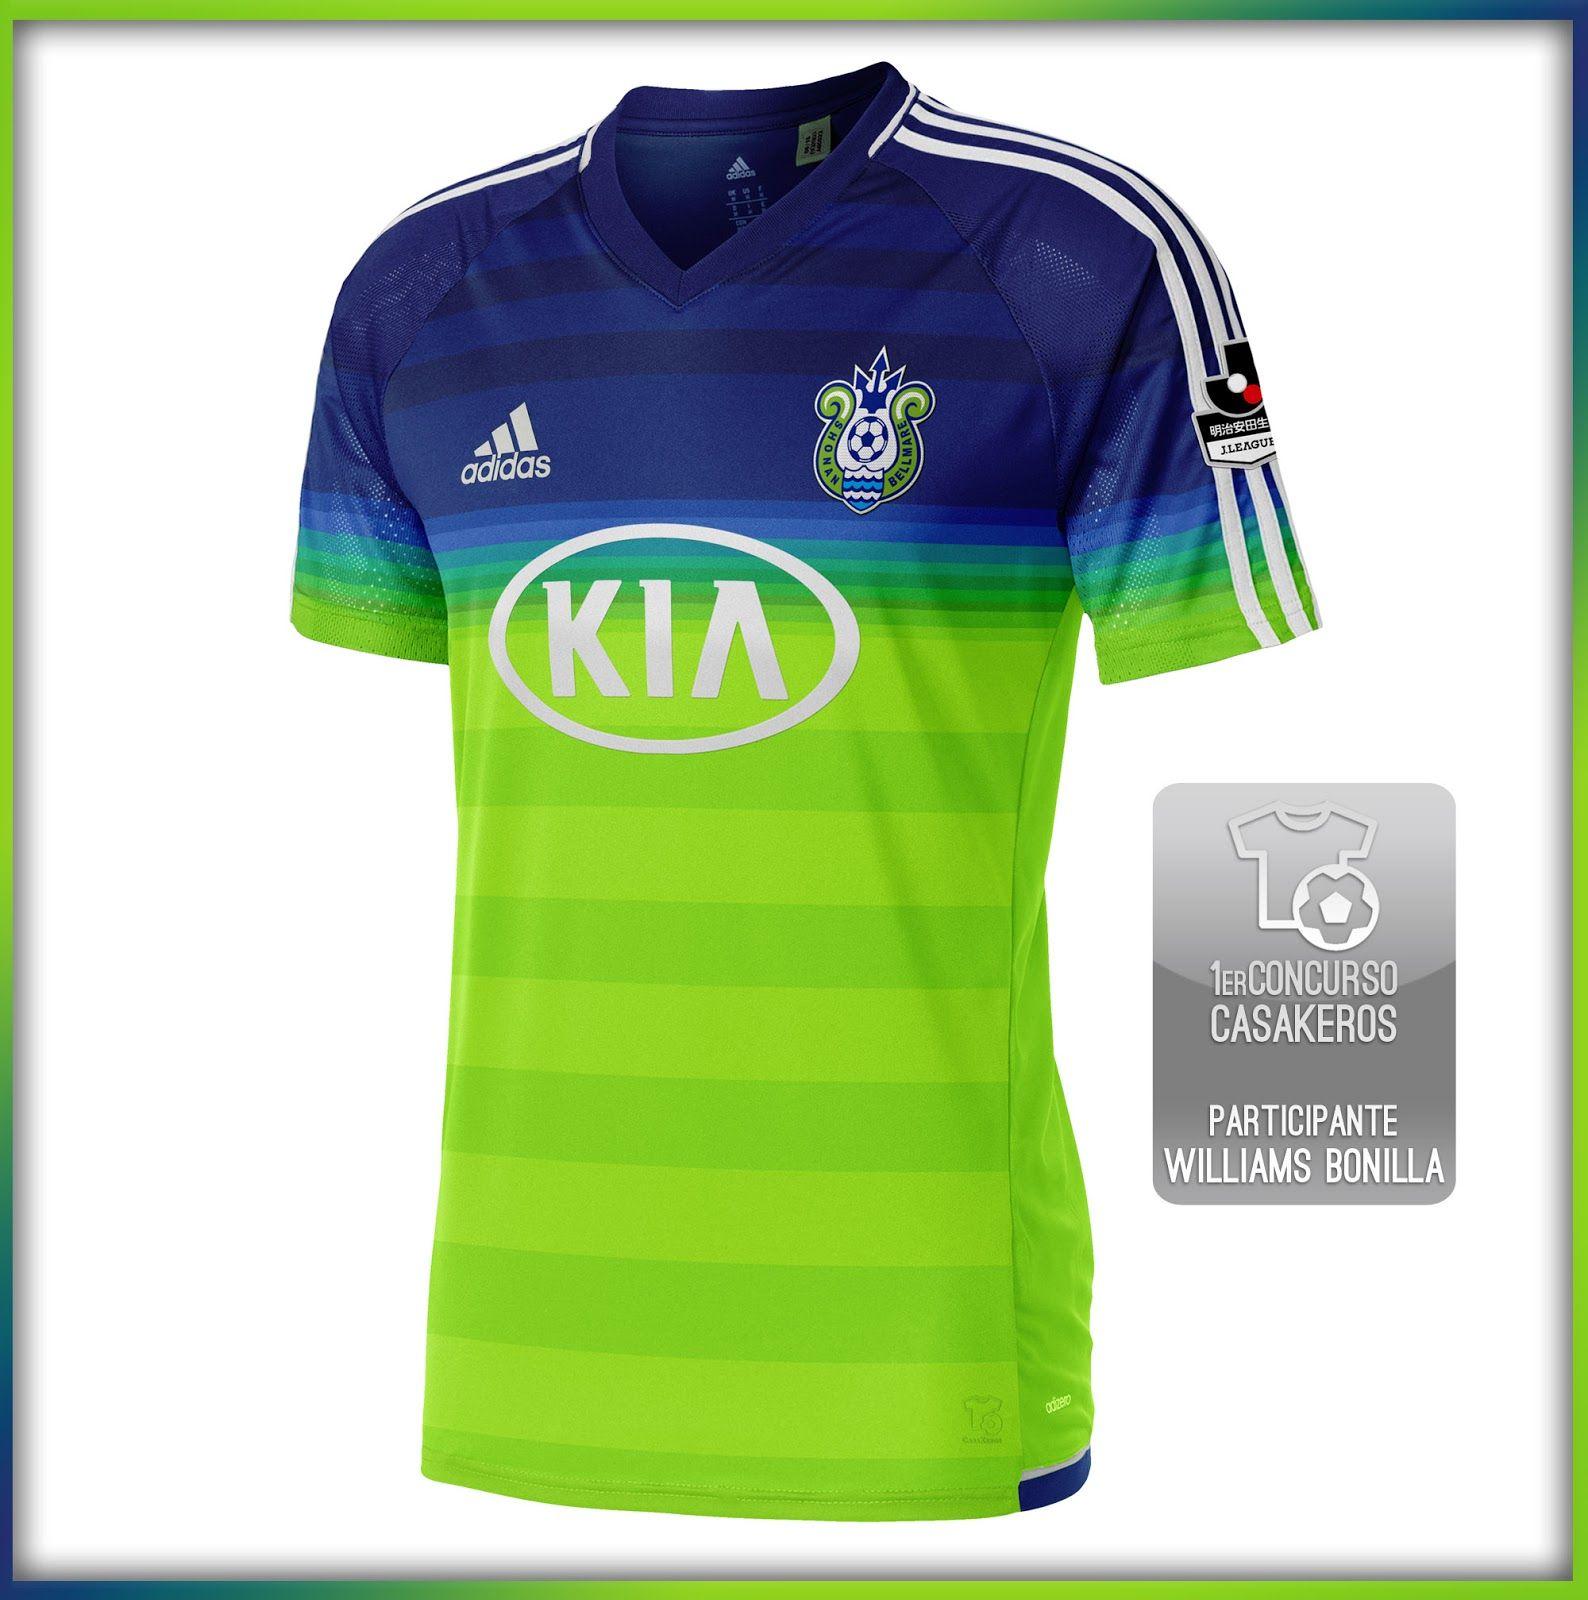 quality design 3b58d 94745 Diseño de camisetas de fútbol real o fantasy    Creamos TEMPLATES de  camisetas de fútbol    Tutoriales    Mockups    Soccer Kit Templates